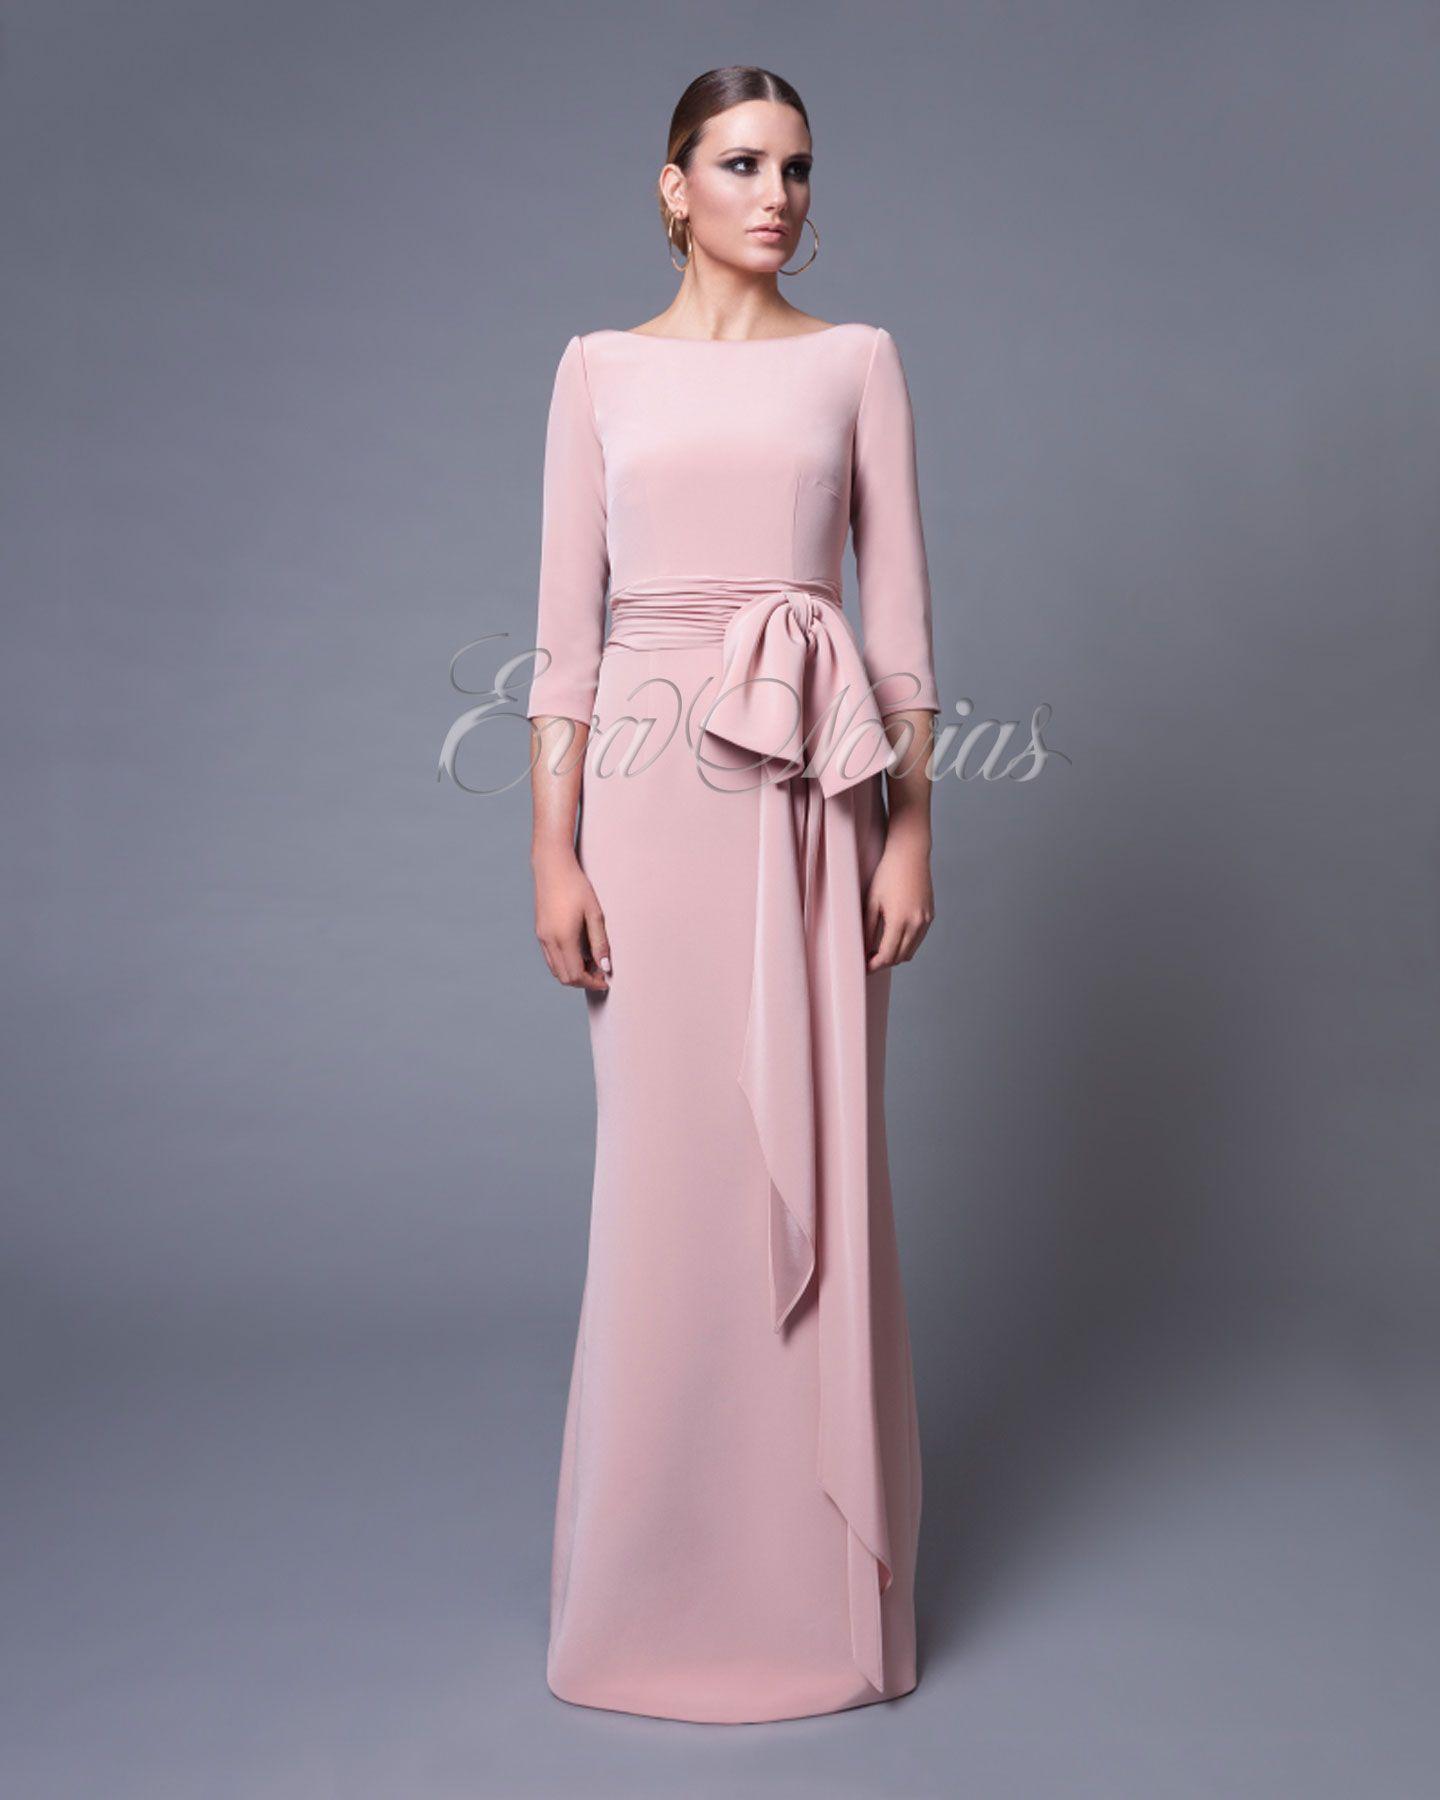 vestido de madrina - Buscar con Google | Boda | Pinterest | Vestido ...